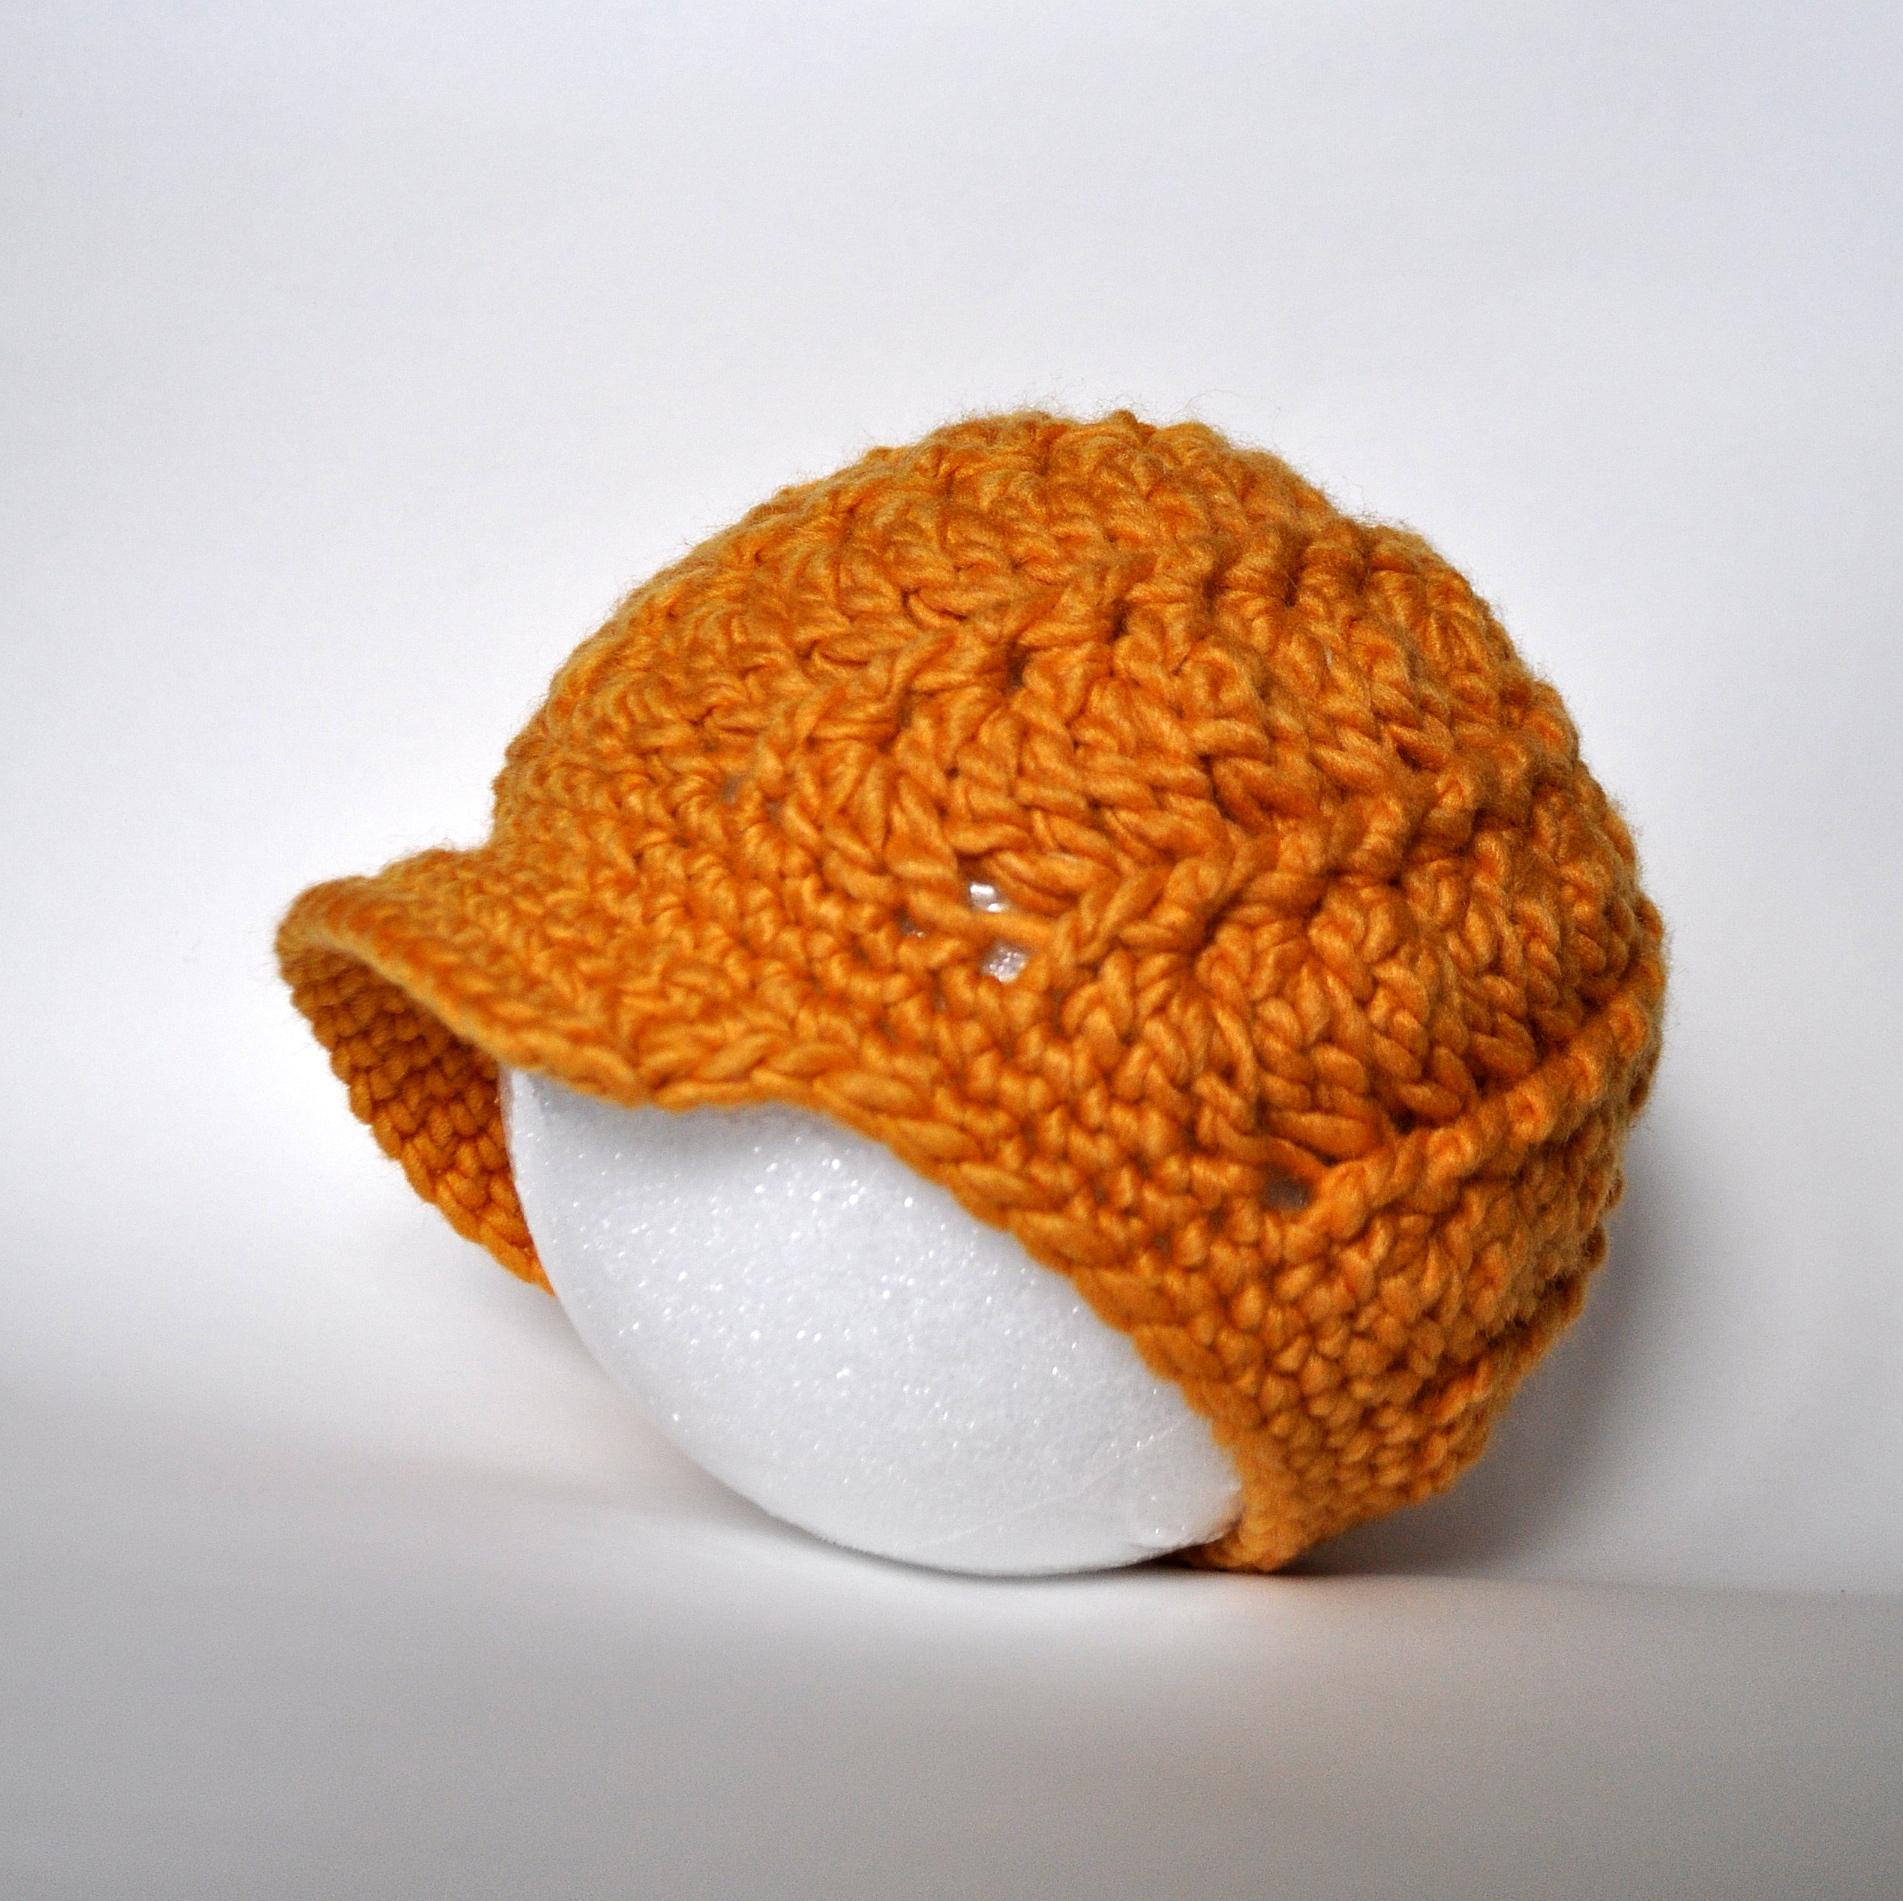 Free Knitting Pattern For Ladies Hat With Brim : Free Pattern: Crochet Women s Swirly Brimmed Hat Classy ...